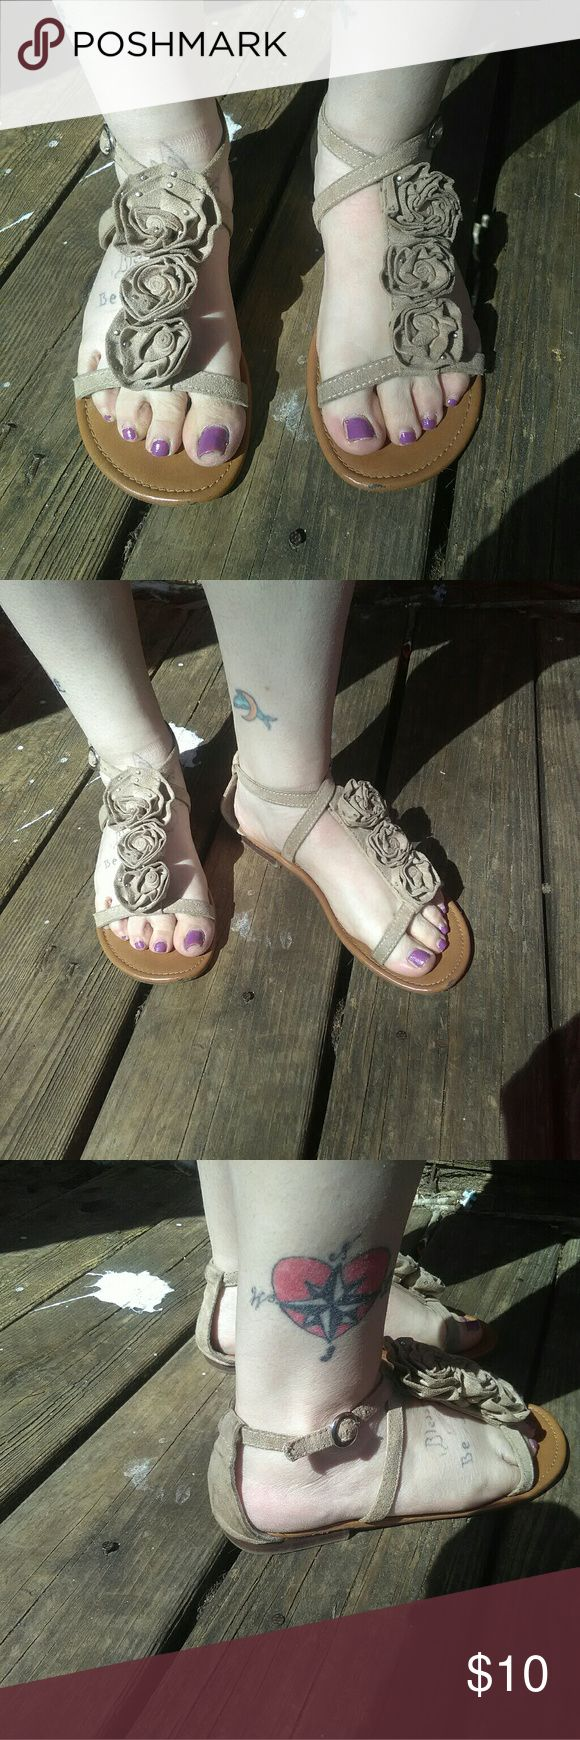 Gap suede sandles Beige suede sandles flowered top adjustable straps GAP Shoes Sandals